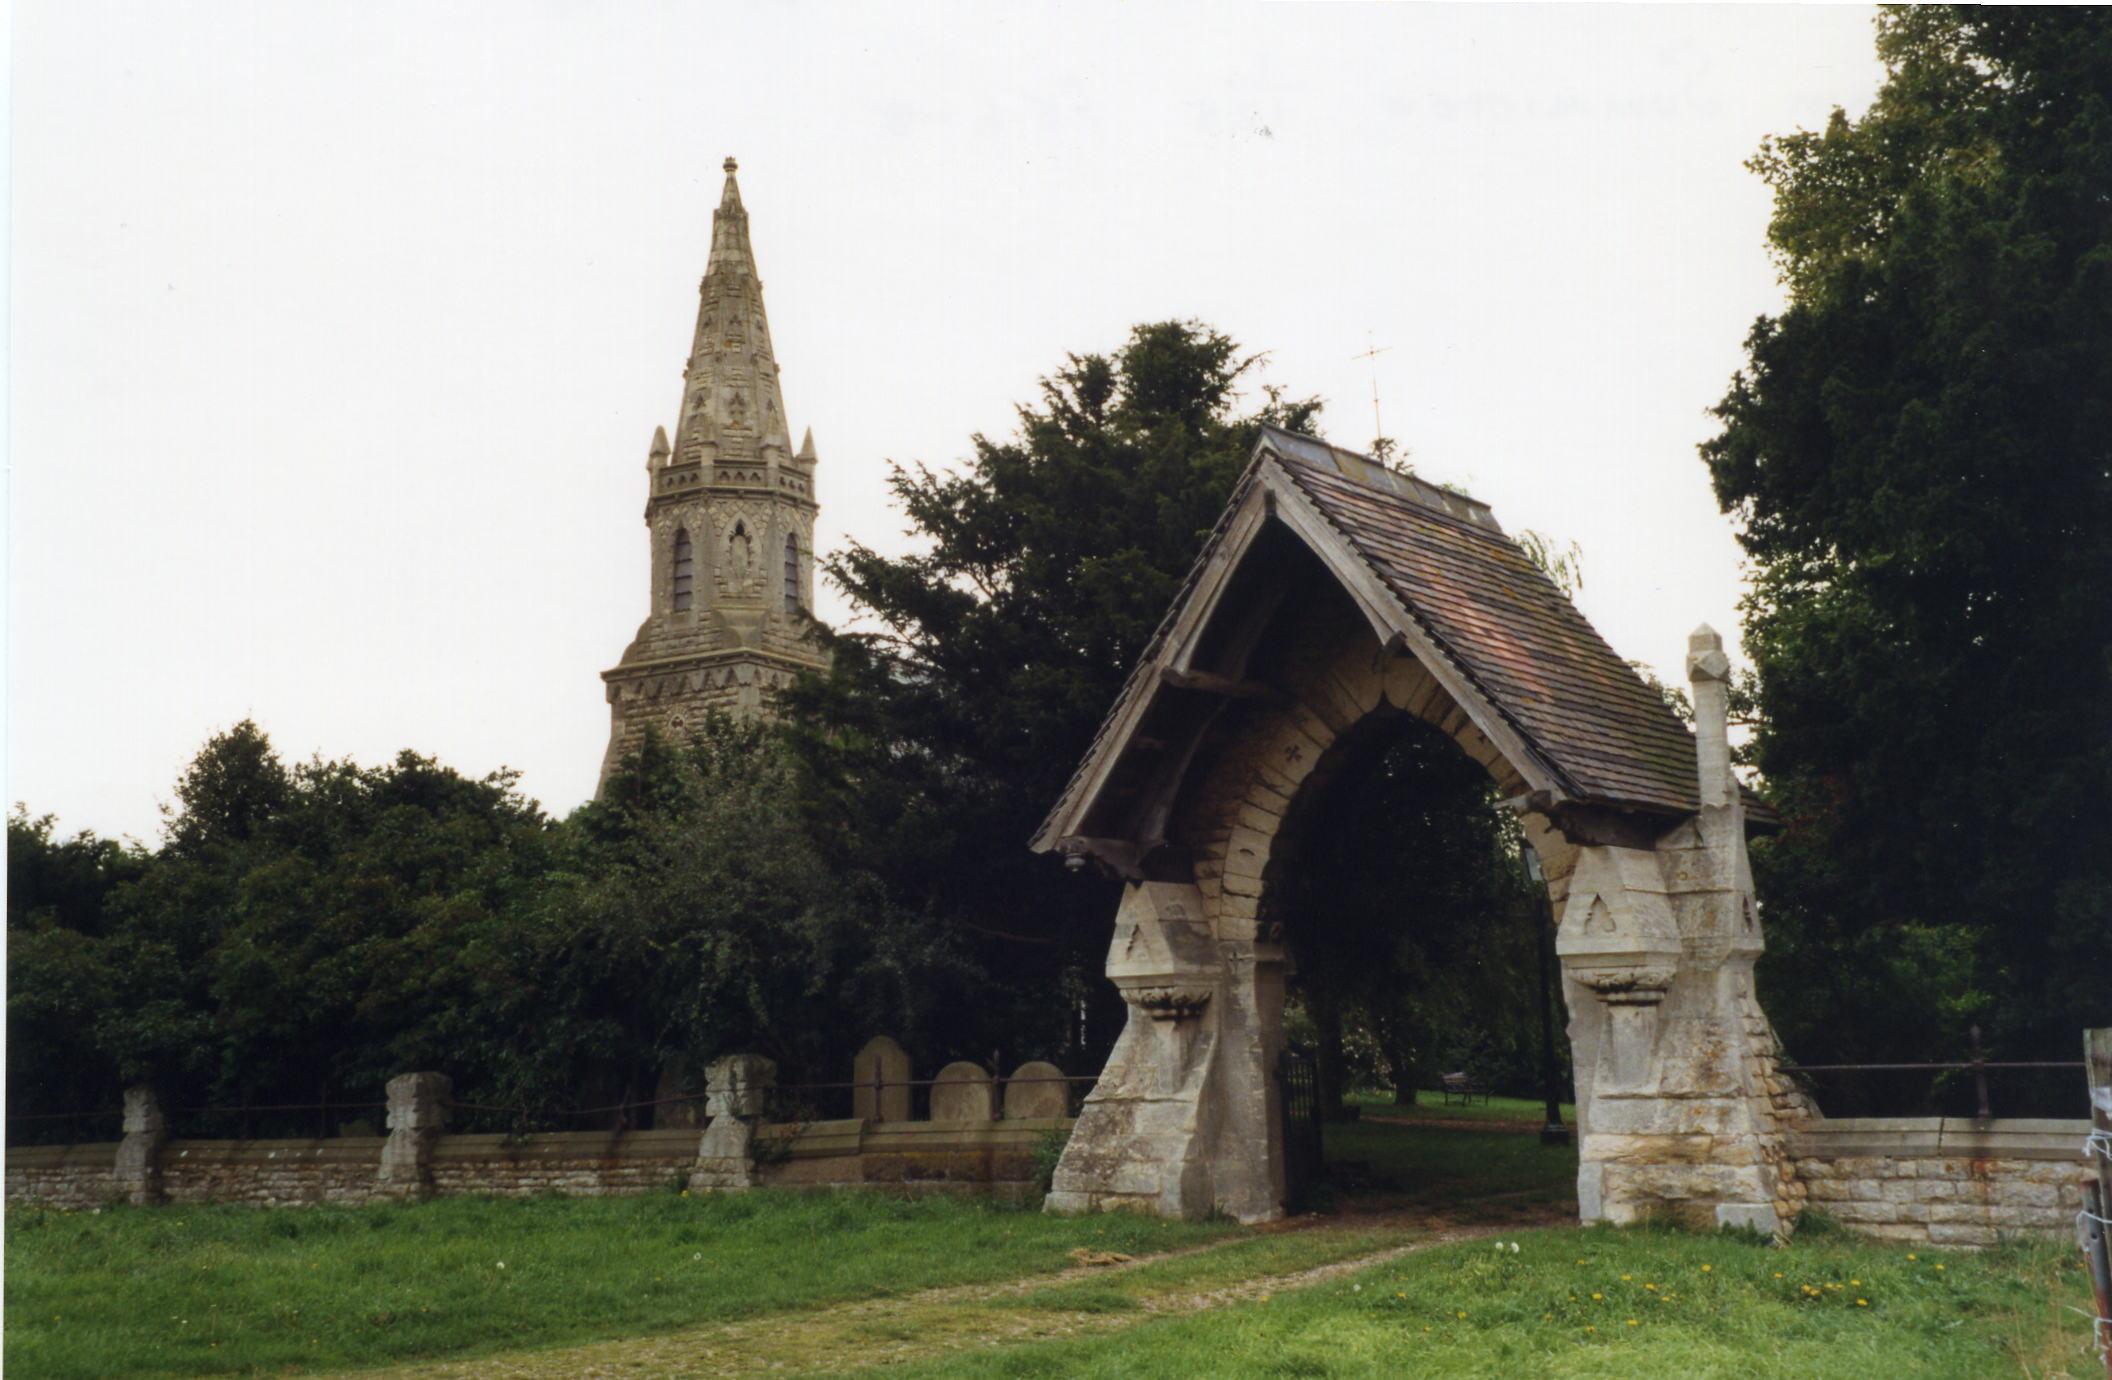 Cold Hanworth All Saints' dwelling house